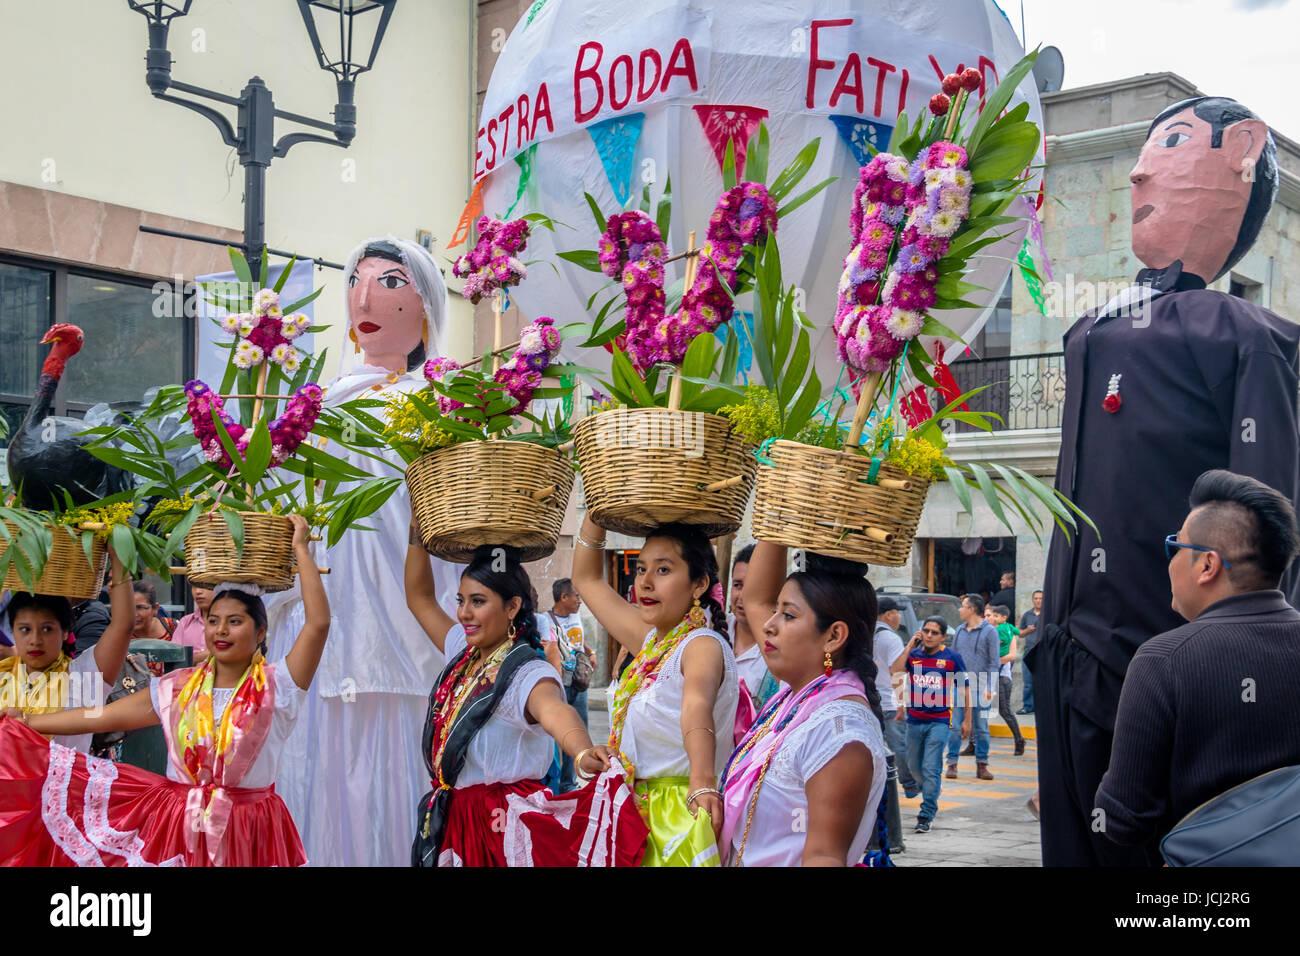 Typical Regional Mexican Wedding Parade know as Calenda de Bodas ...